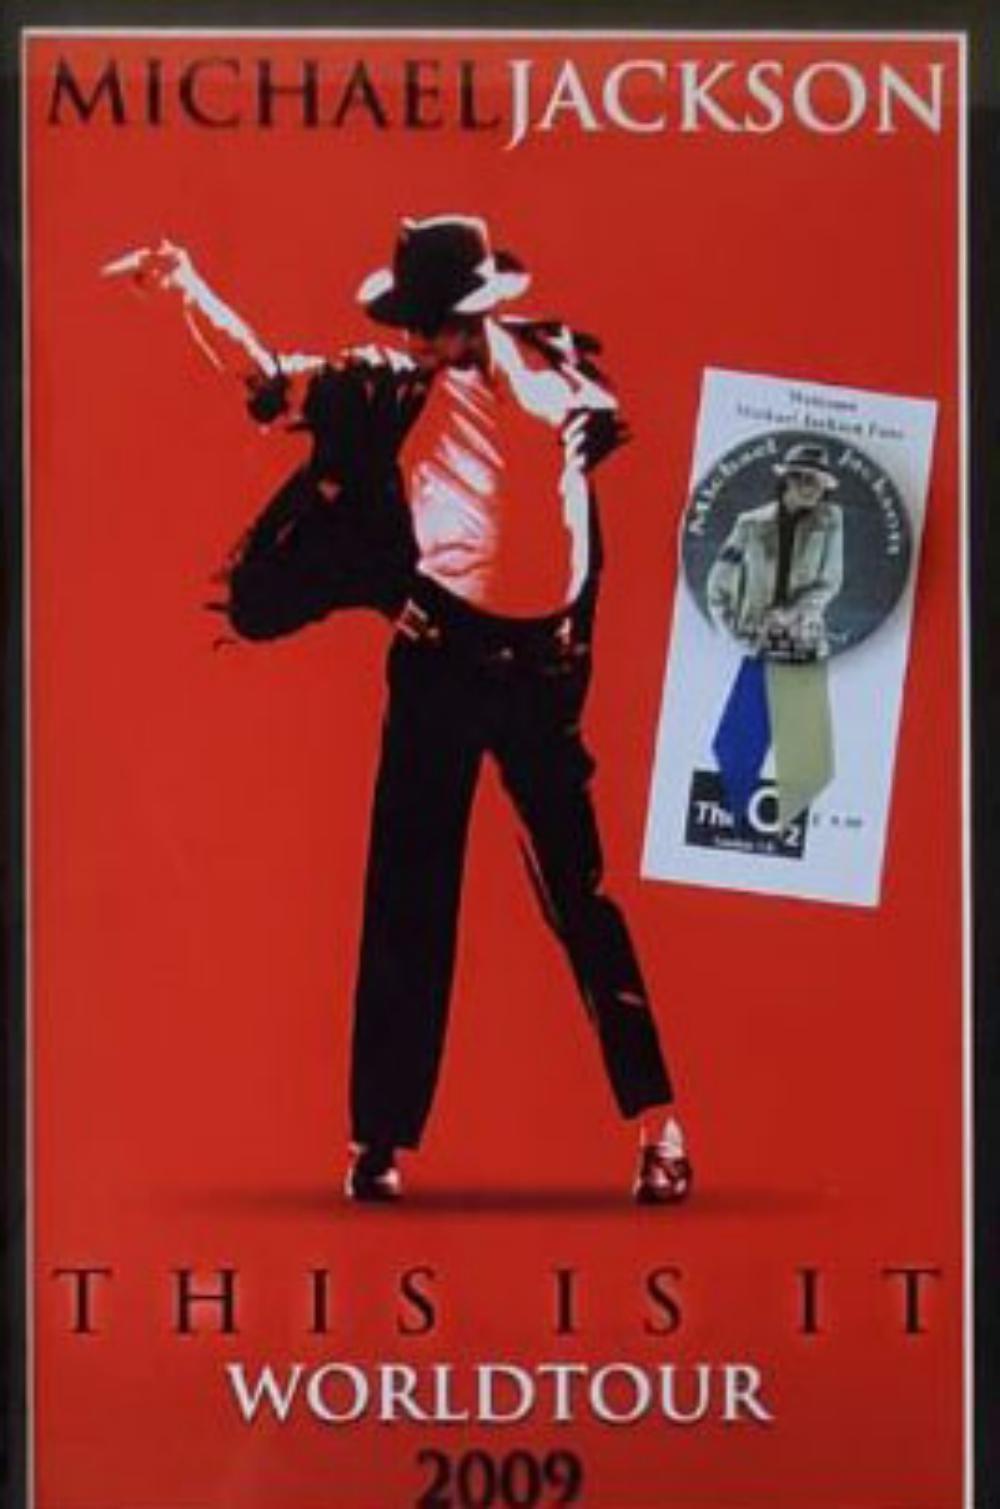 MICHAEL JACKSON, FRAMED ORIGINAL 2009 TOUR W/PIN